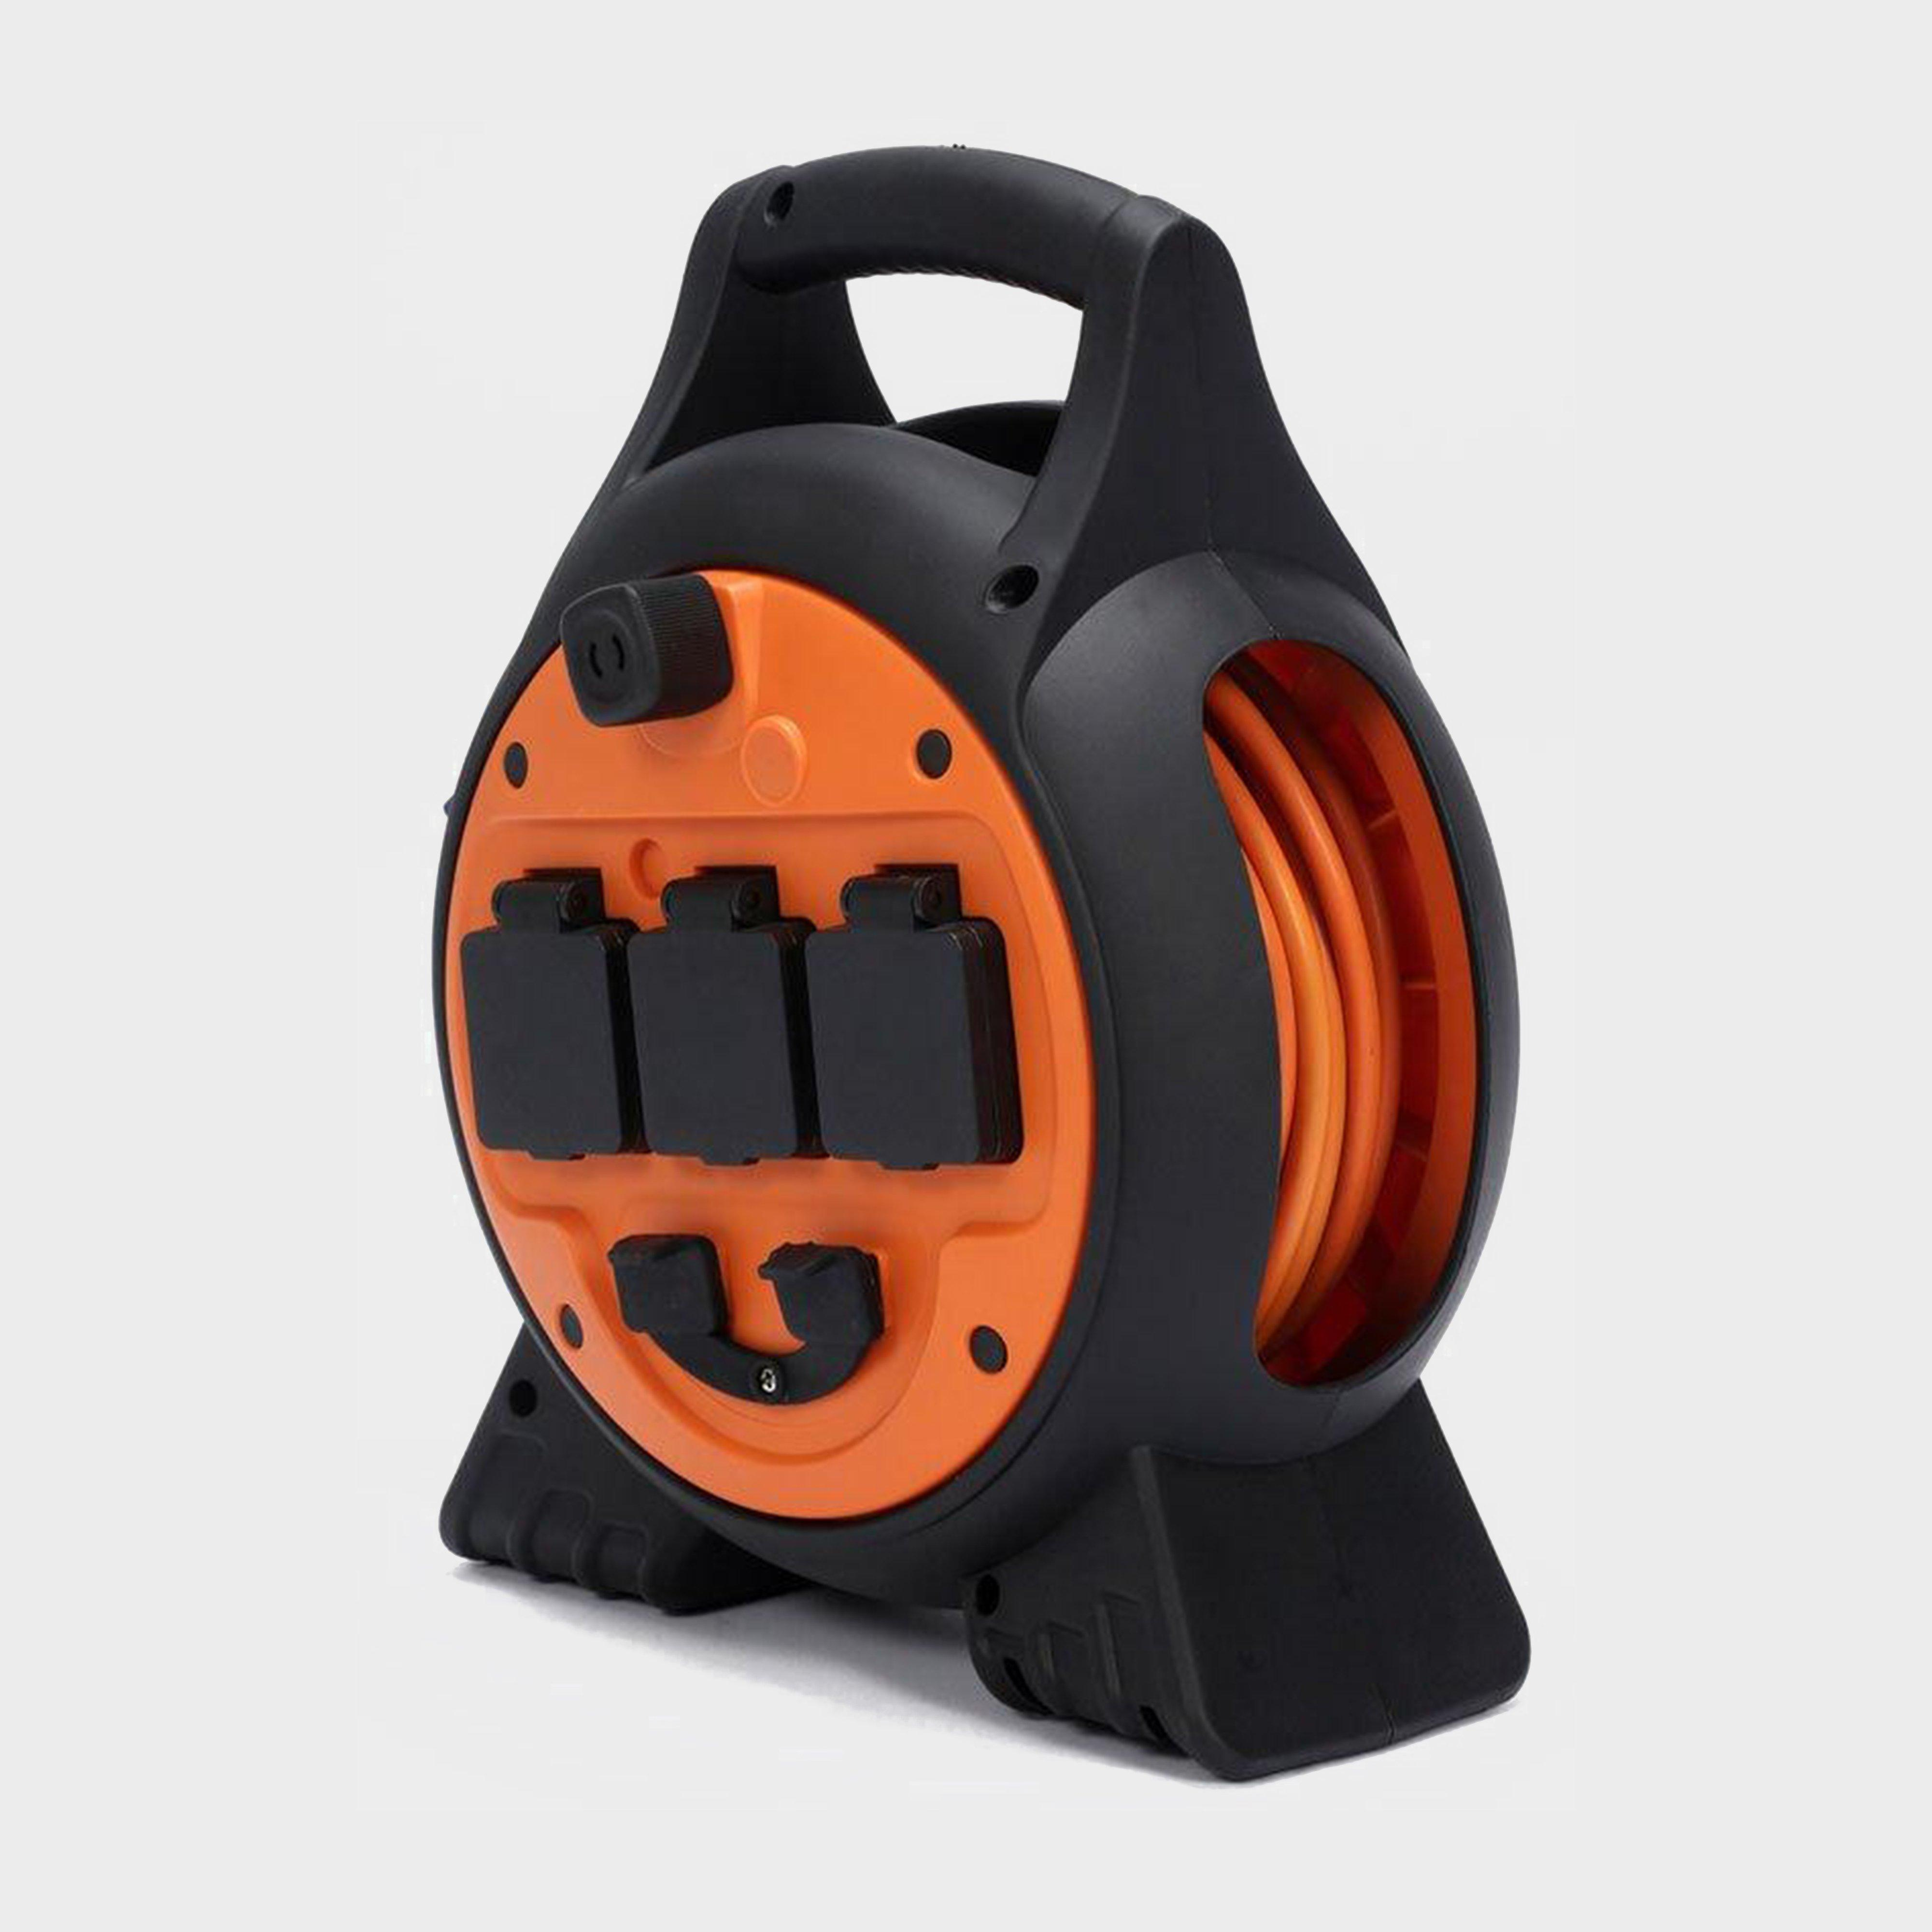 HI-GEAR Mobile Mains Roller Power Unit (15m), orange/black